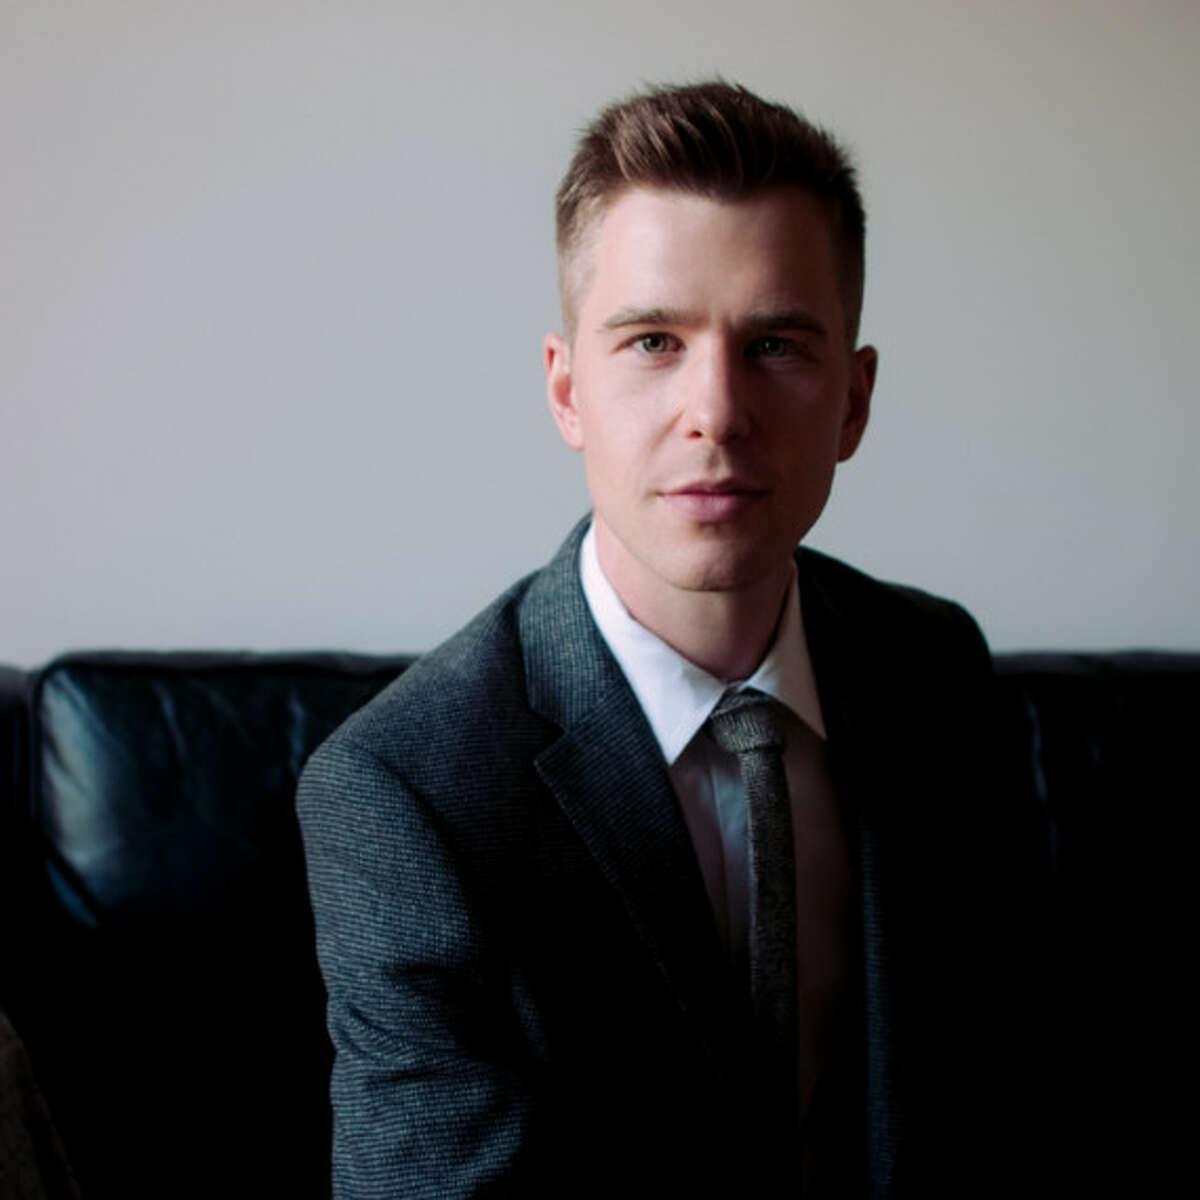 Daniel Moody